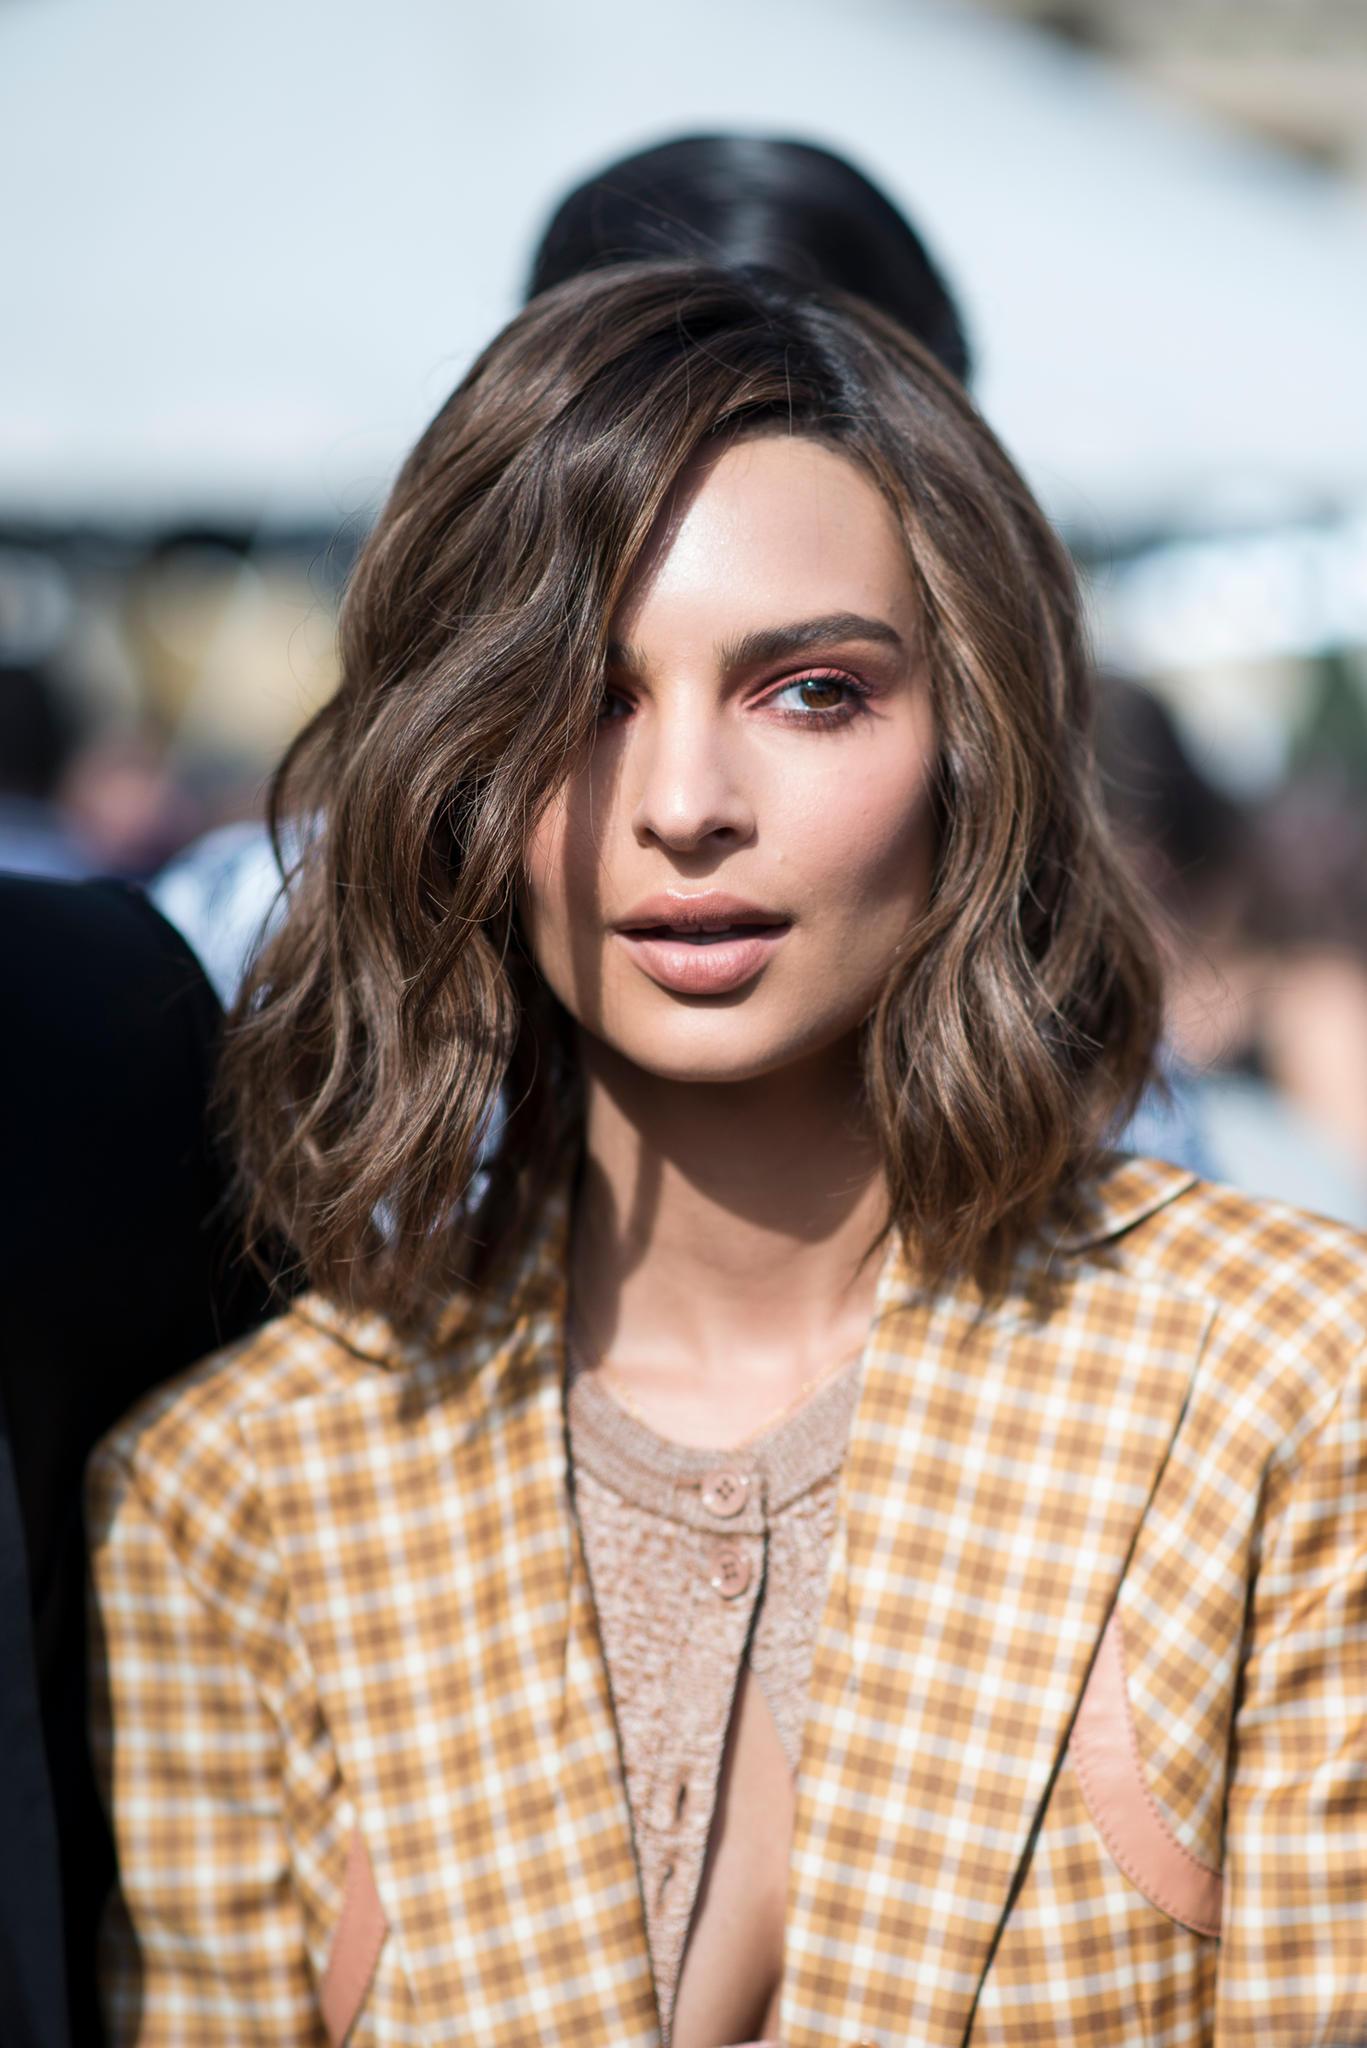 Mode Frisuren 2019  Trendfrisuren 2019 Die schönsten Looks